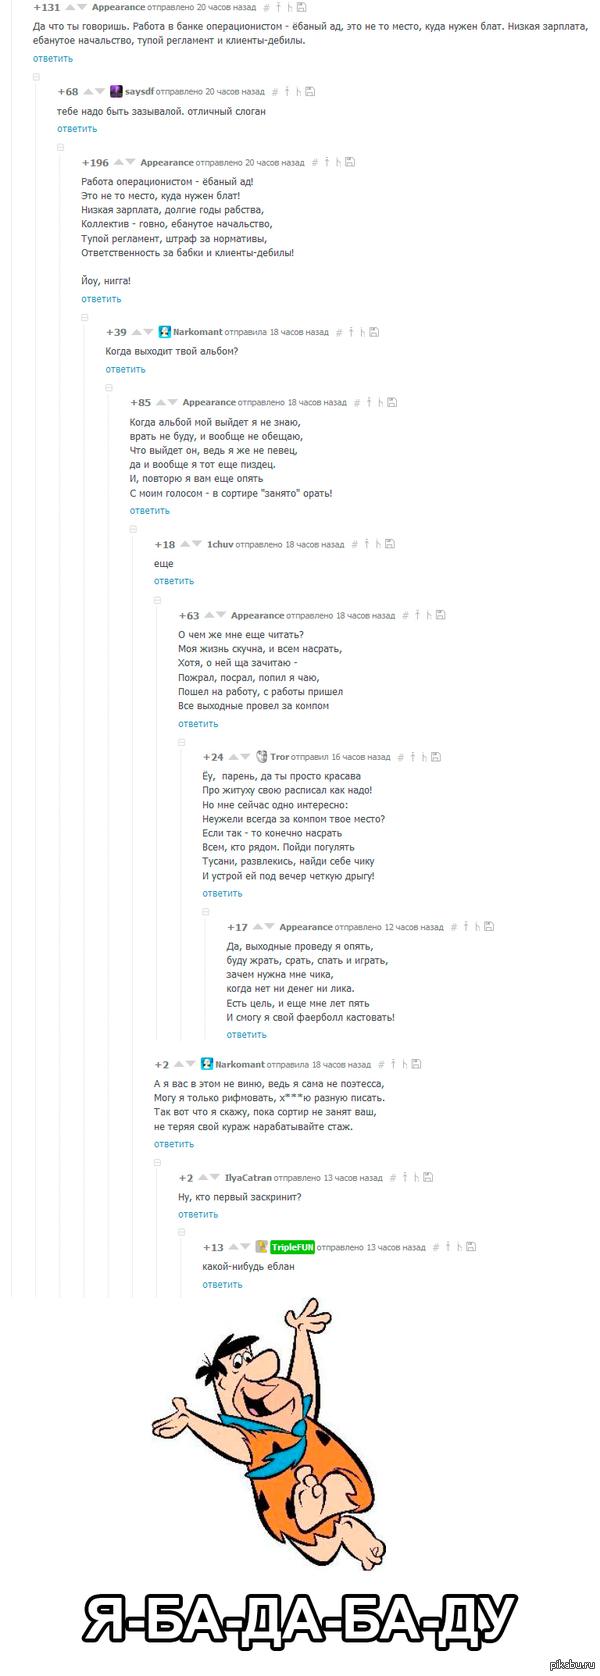 "Комментарии Appearance, а ты хорош ) из поста <a href=""http://pikabu.ru/story/sberbank_post_nedoumeniya_3538086"">http://pikabu.ru/story/_3538086</a>"